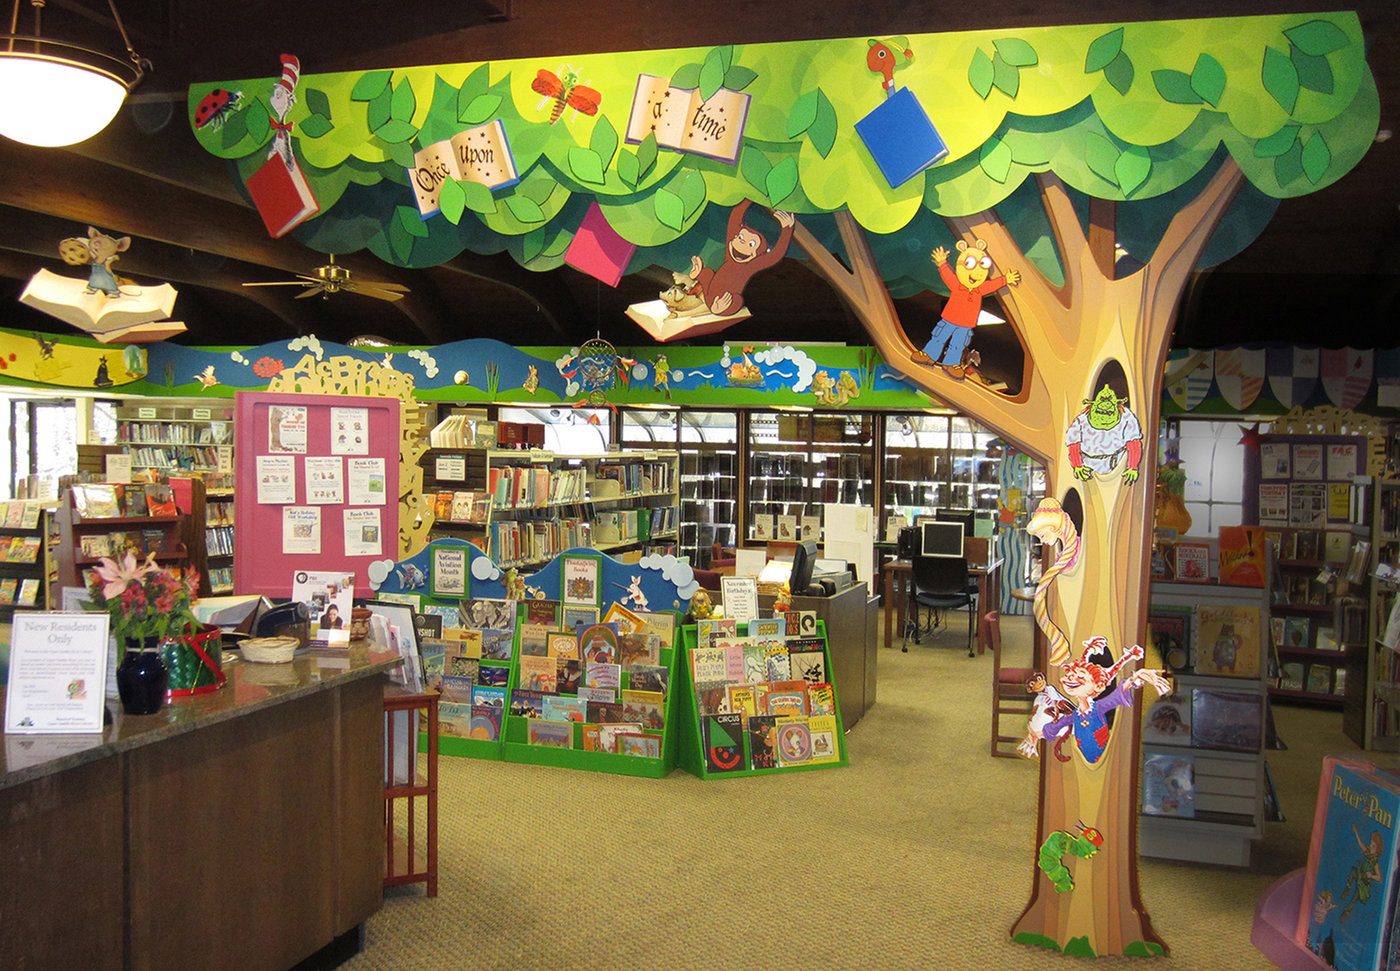 Upper Saddle River Nj >> Childrens Library Design by Janice Davis at Coroflot.com